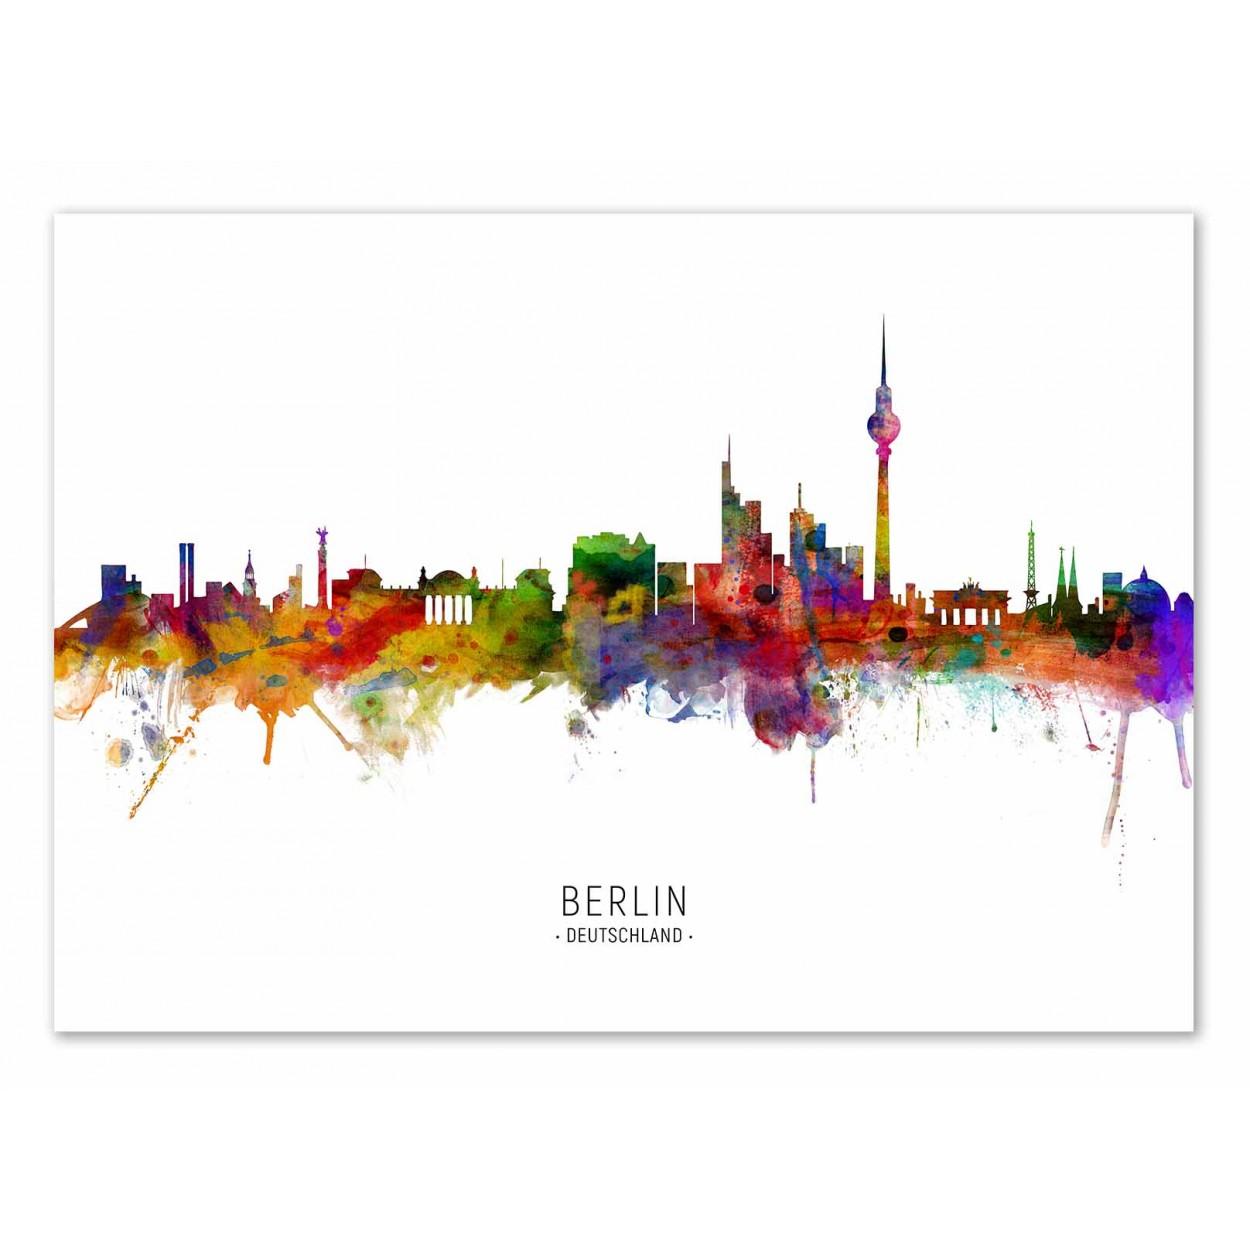 BERLIN GERMANY SKYLINE (COLORED VERSION) -   Affiche d'art 50 x 70 cm